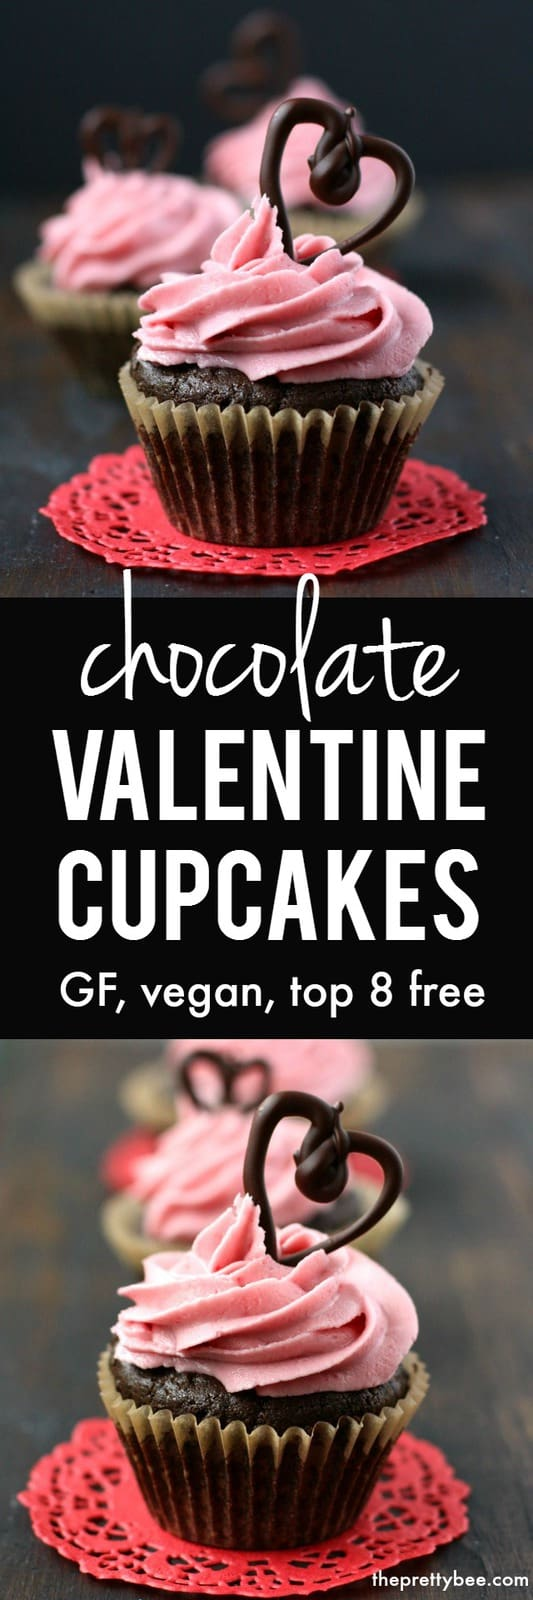 Chocolate Valentine Cupcakes Gluten Free Vegan The Pretty Bee